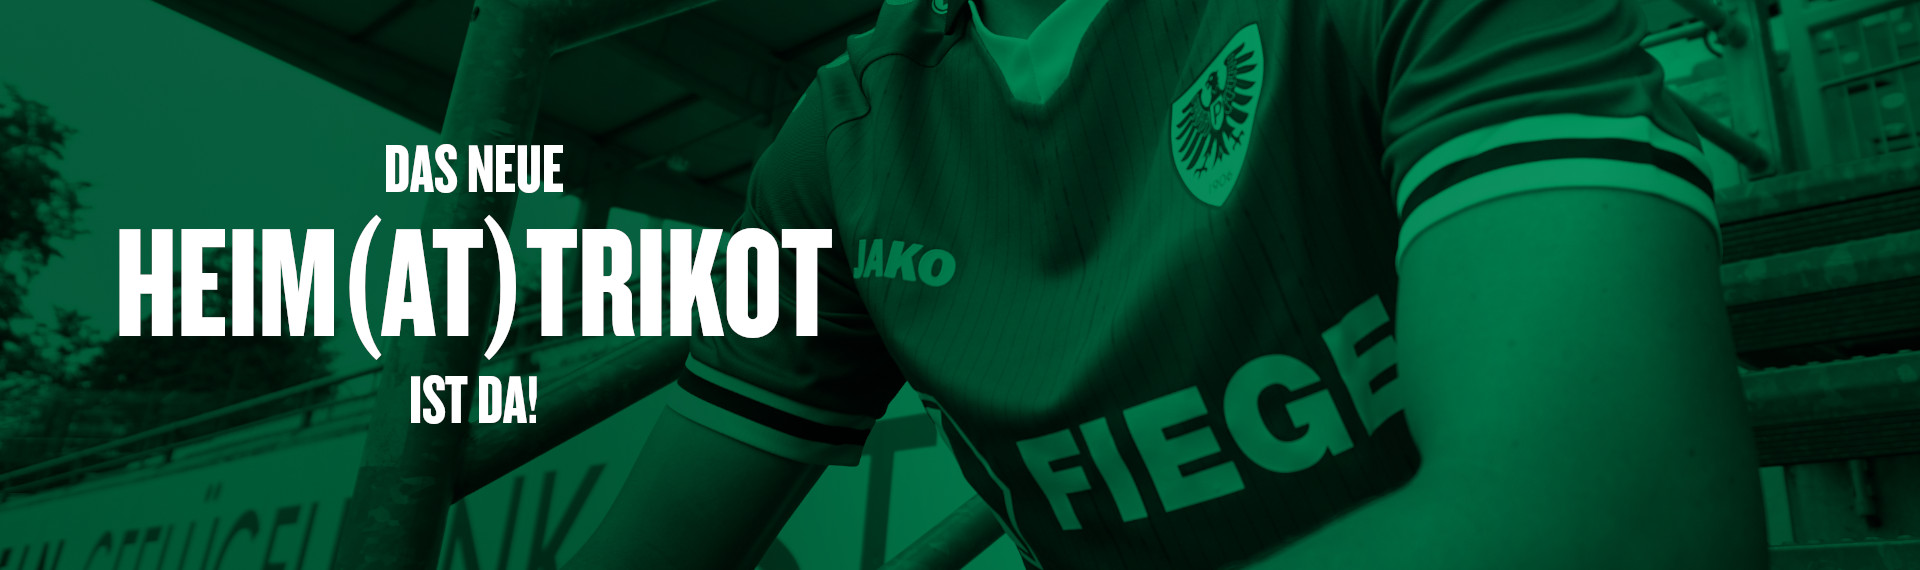 trikot_header_fanshop.jpg